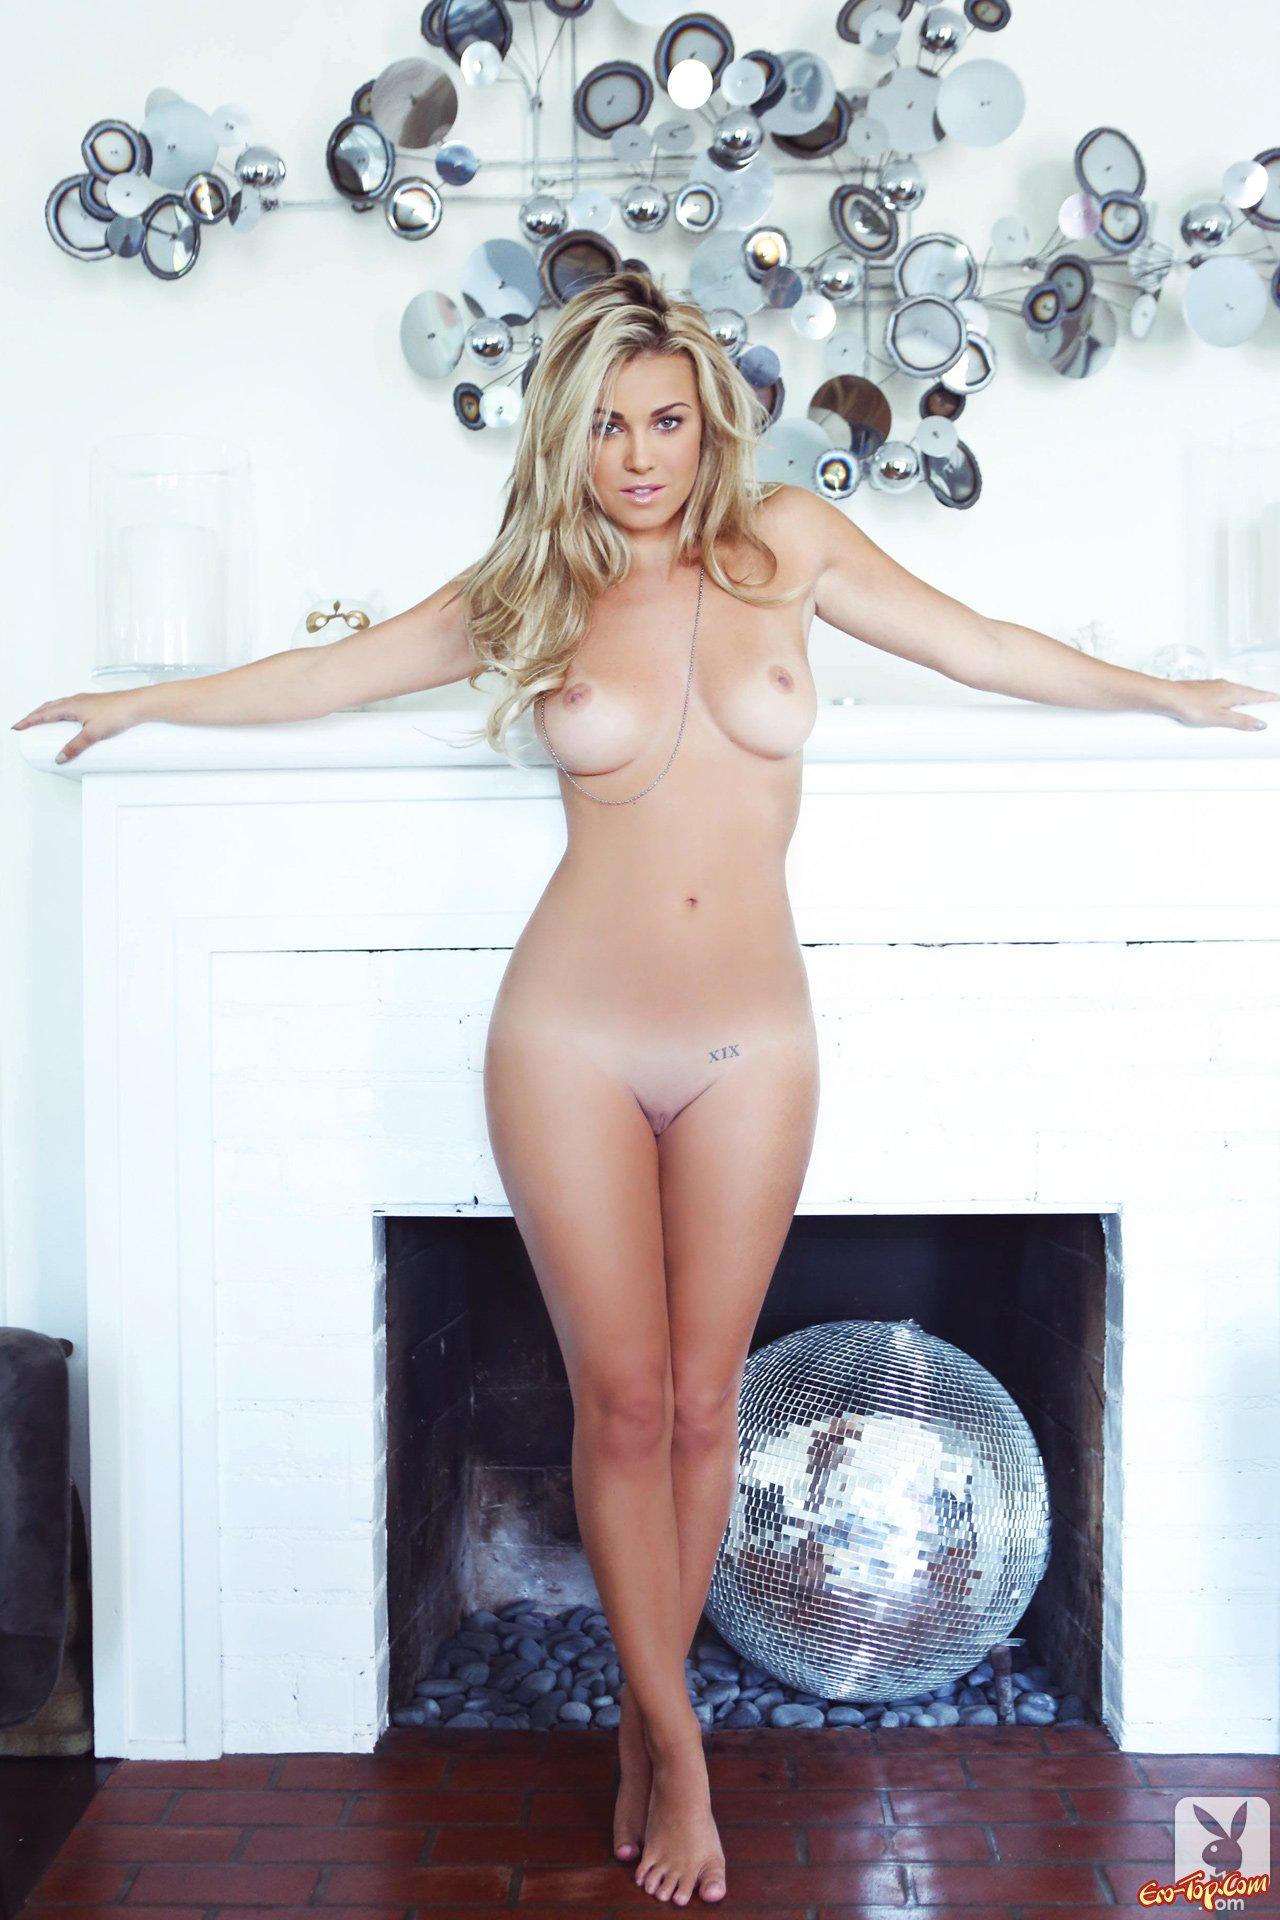 Scarlett pomers nude pics